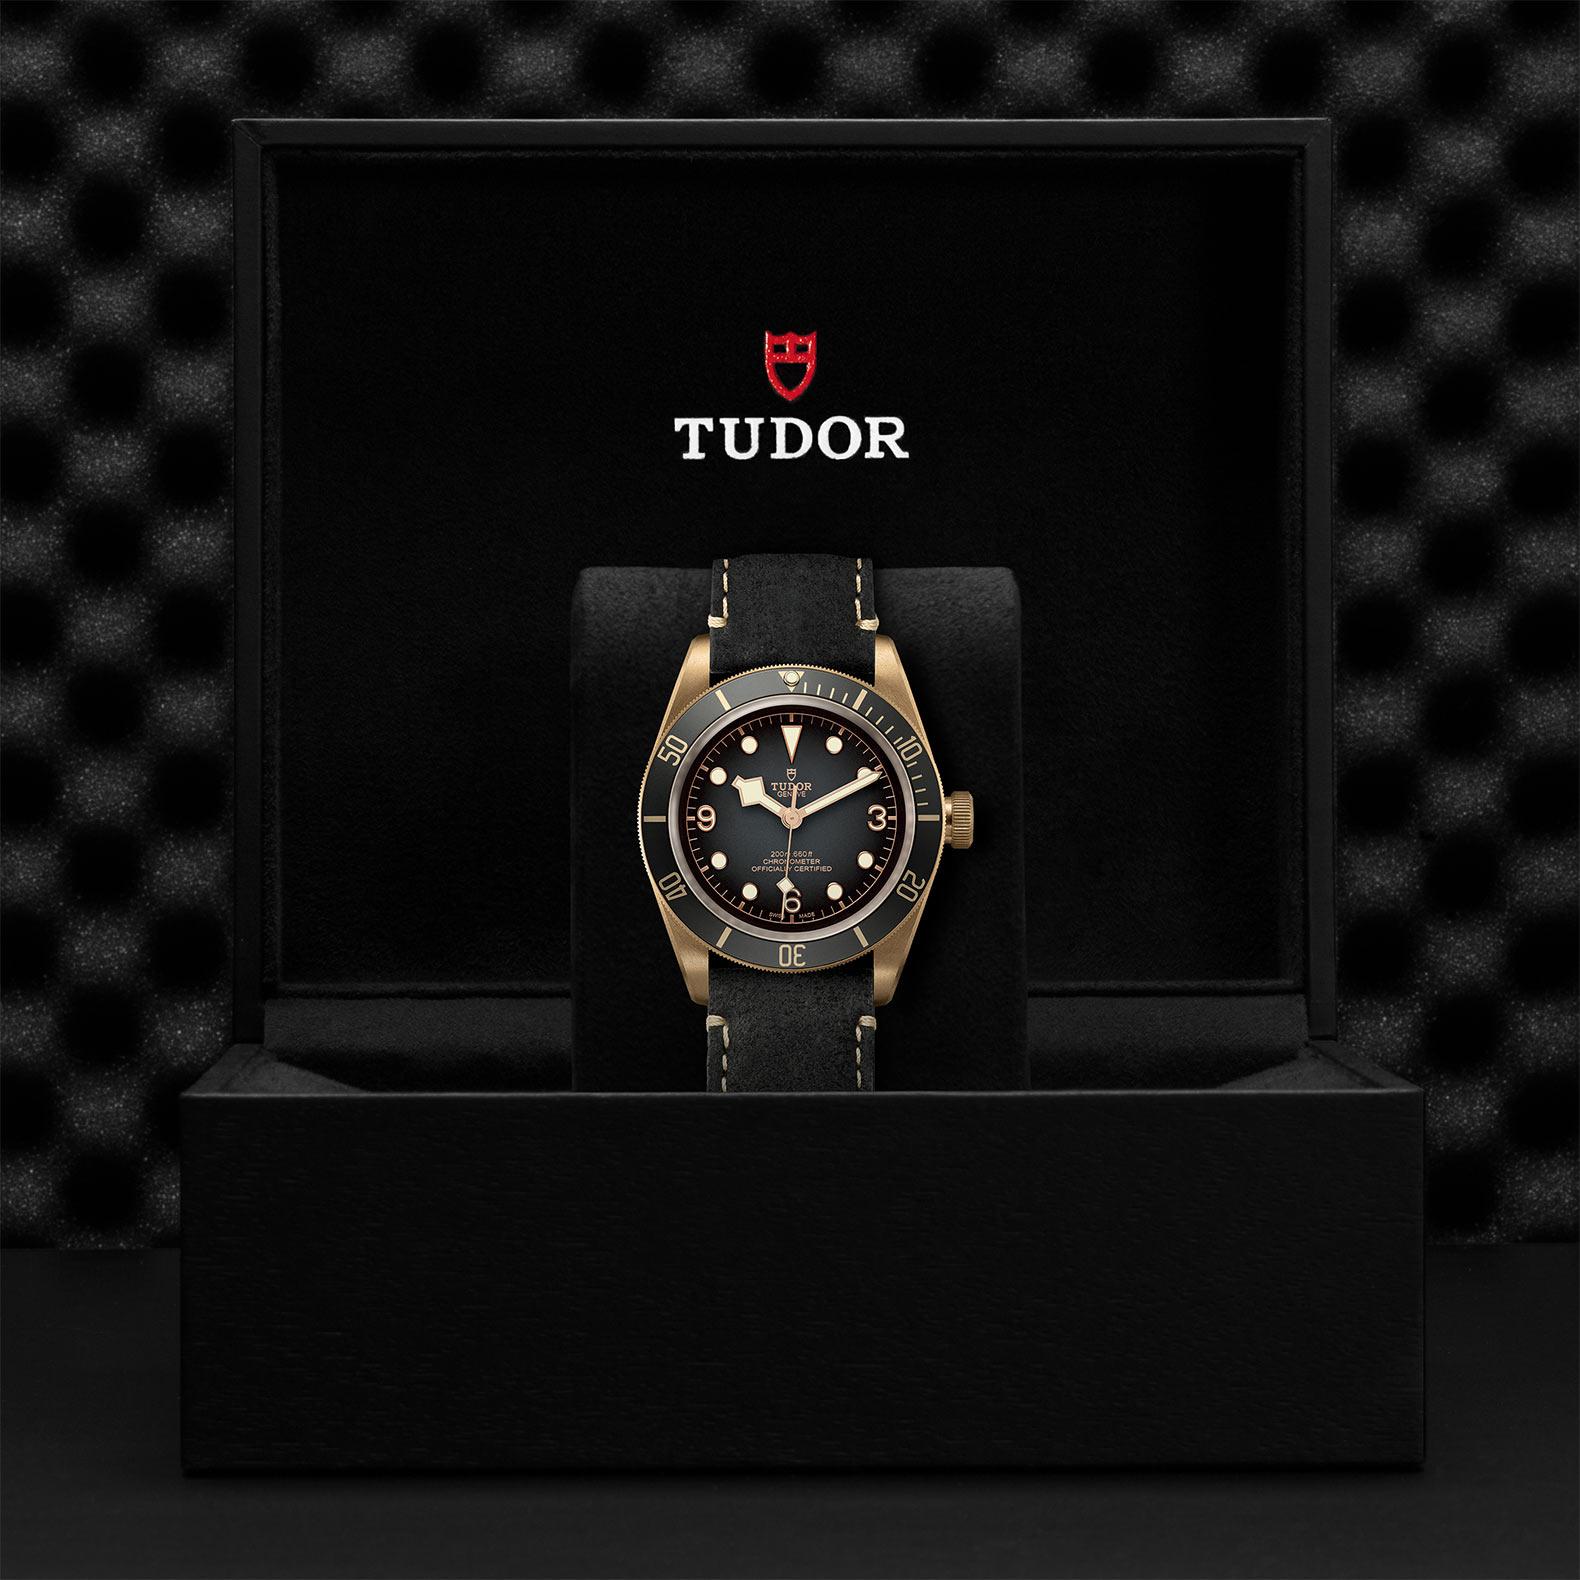 Tudor_M79250ba-0001